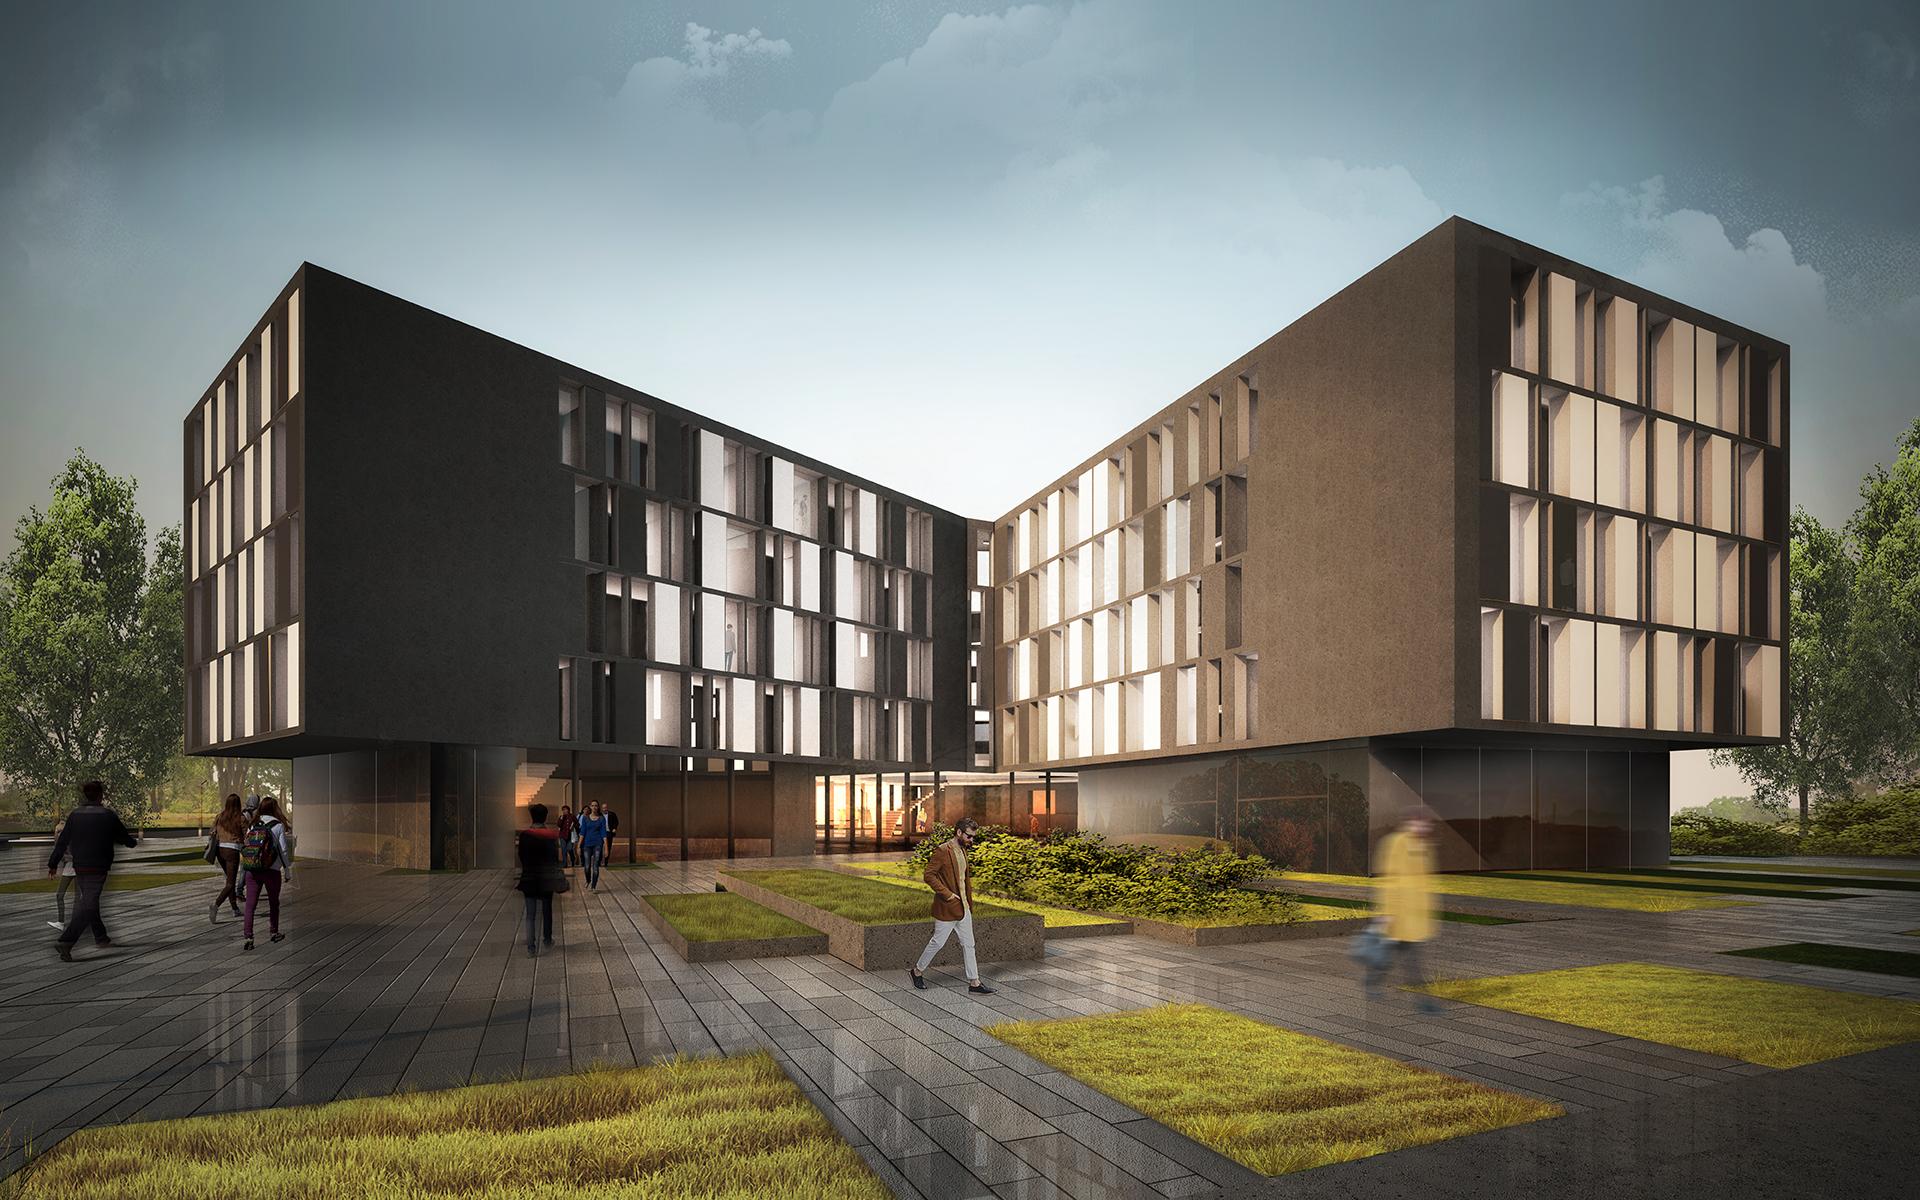 poznan-student-housing-1